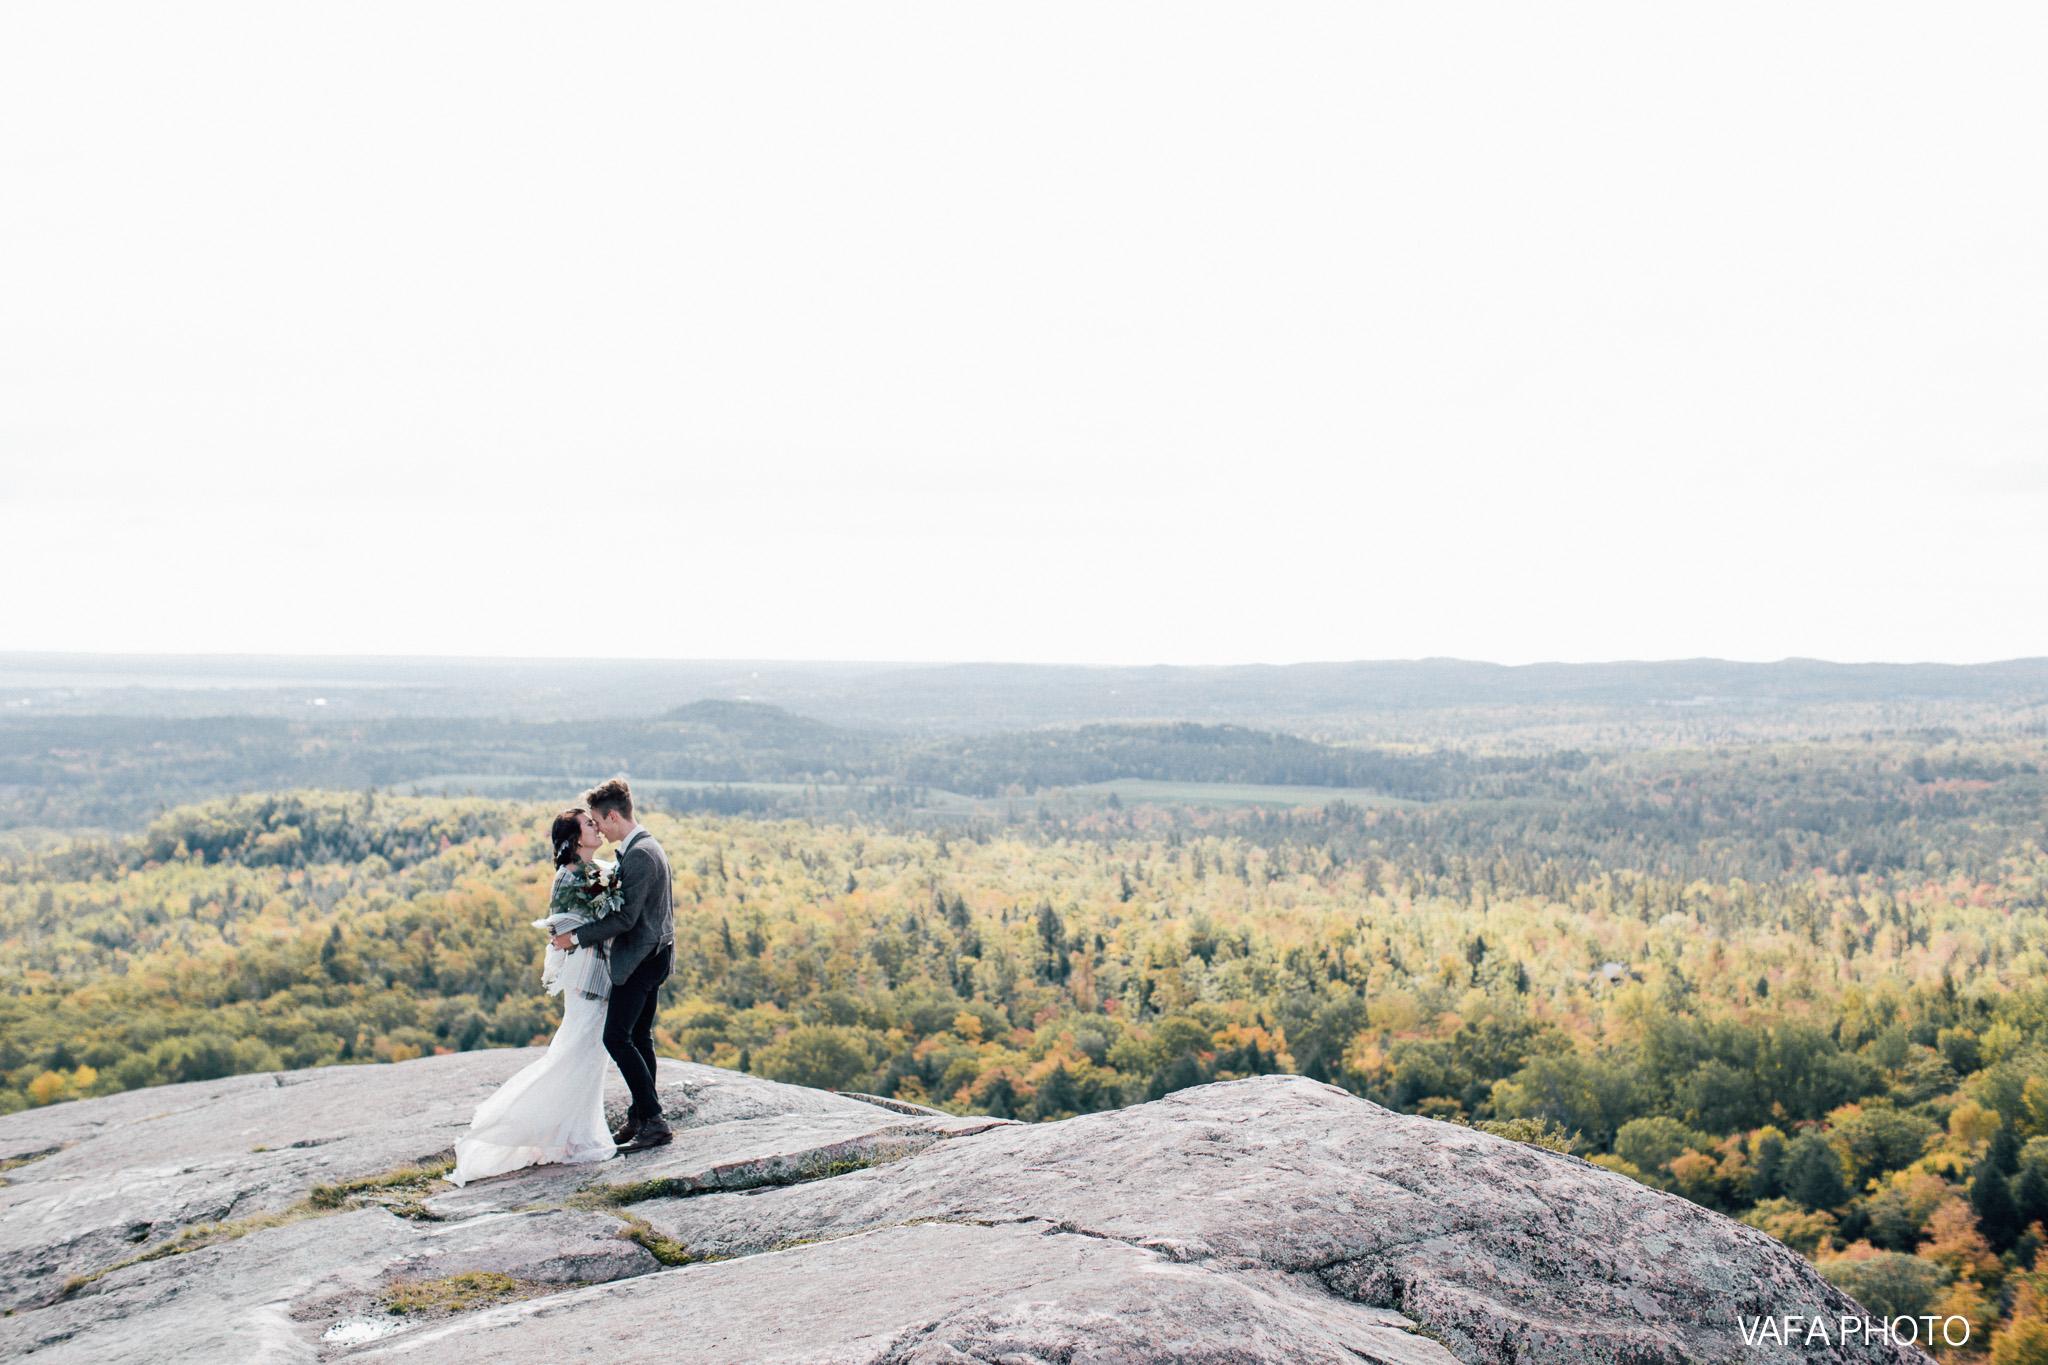 Hogback-Mountain-Wedding-Chelsea-Josh-Vafa-Photo-403.jpg